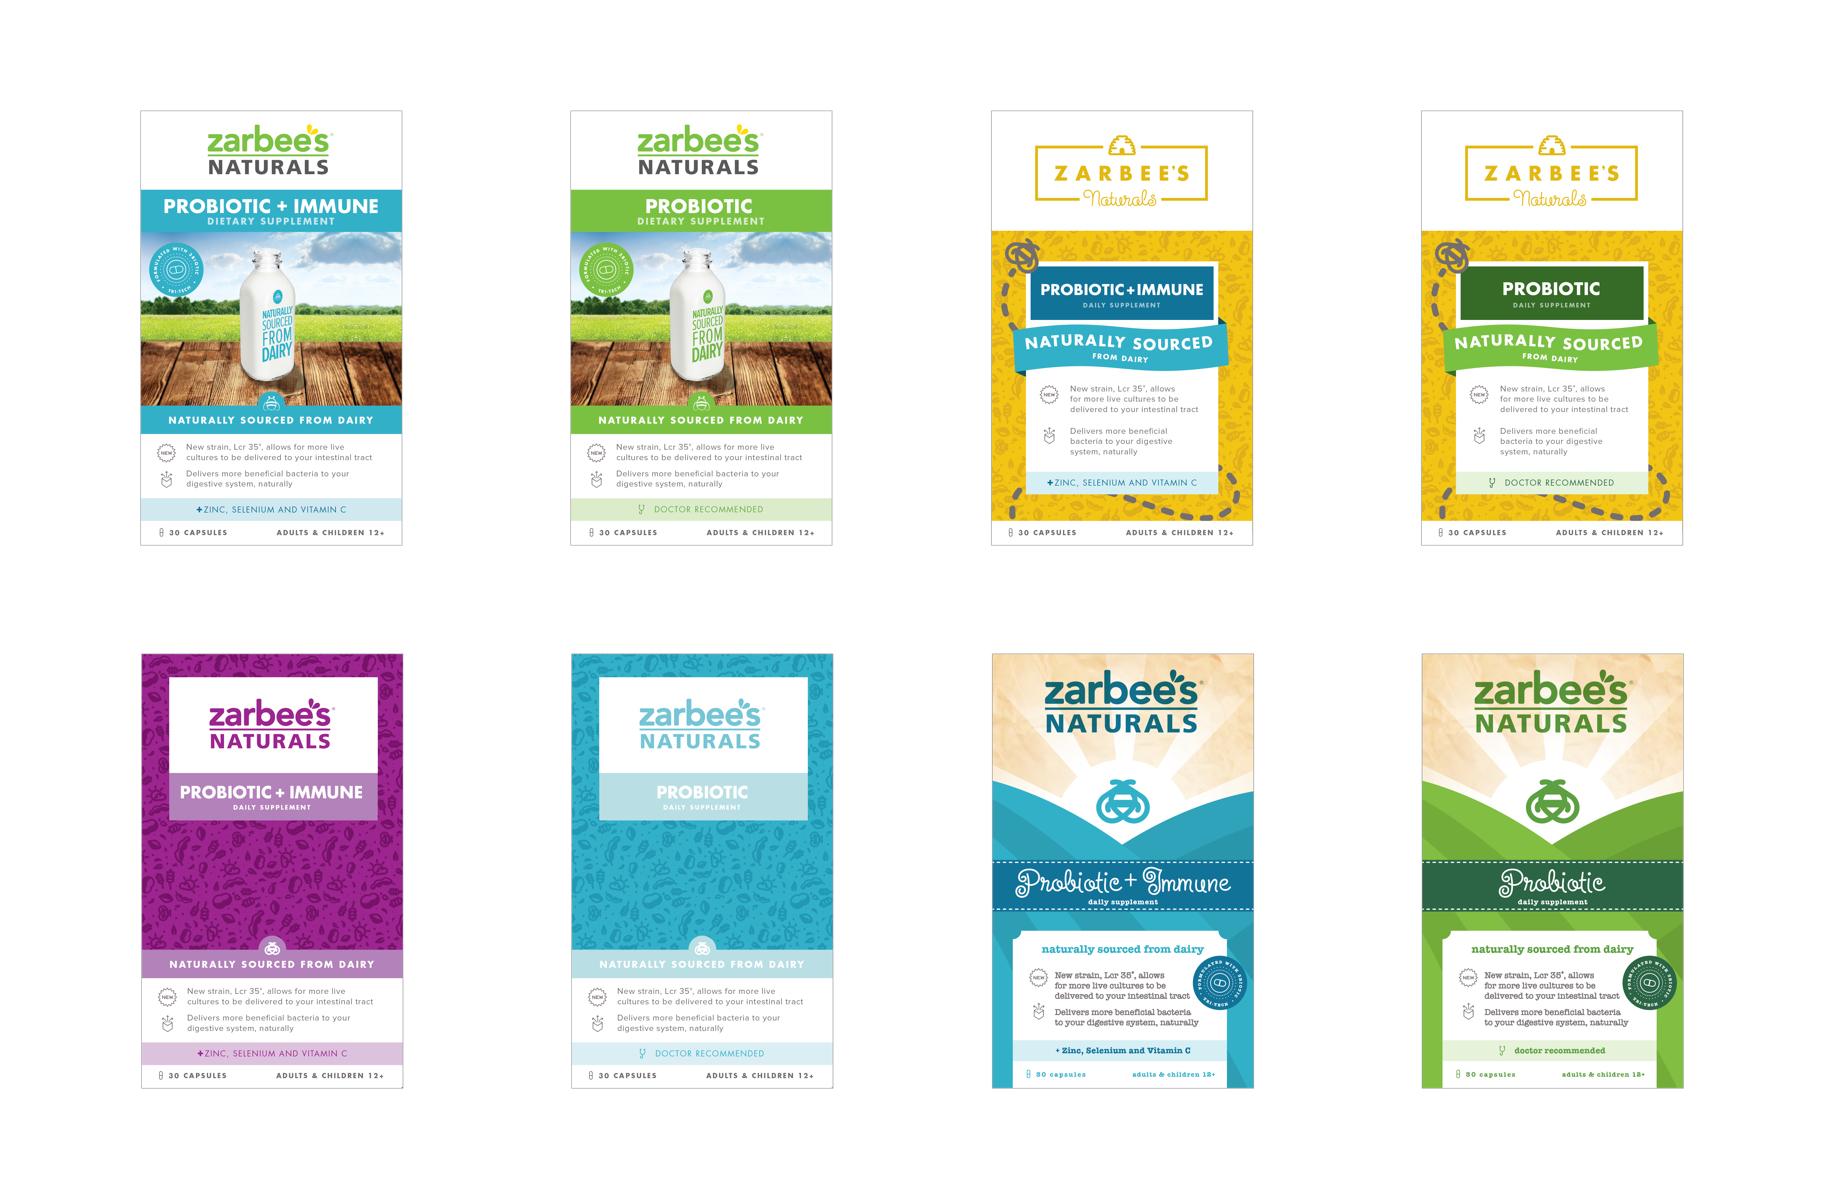 Sixth round of Zarbee's Naturals Probiotic packaging design